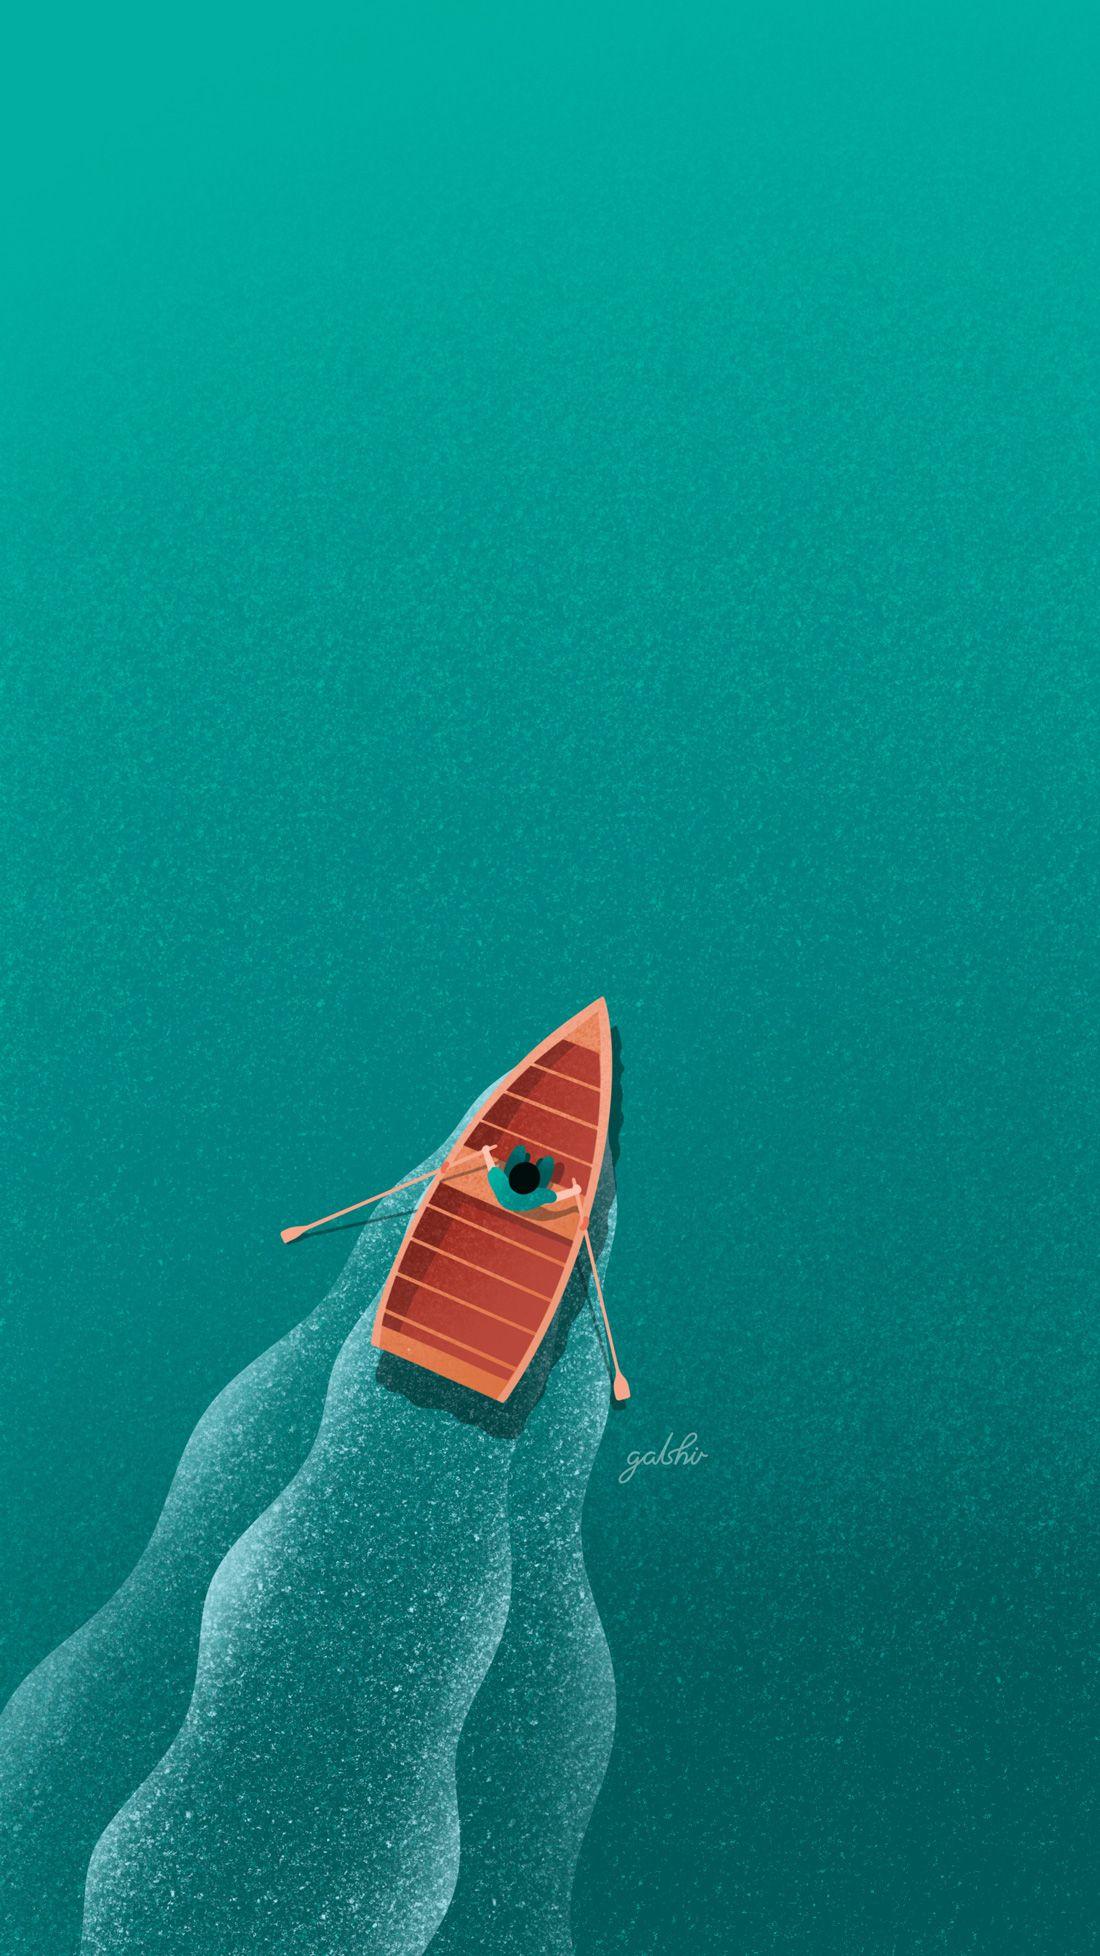 Gal Shir Boat illustration